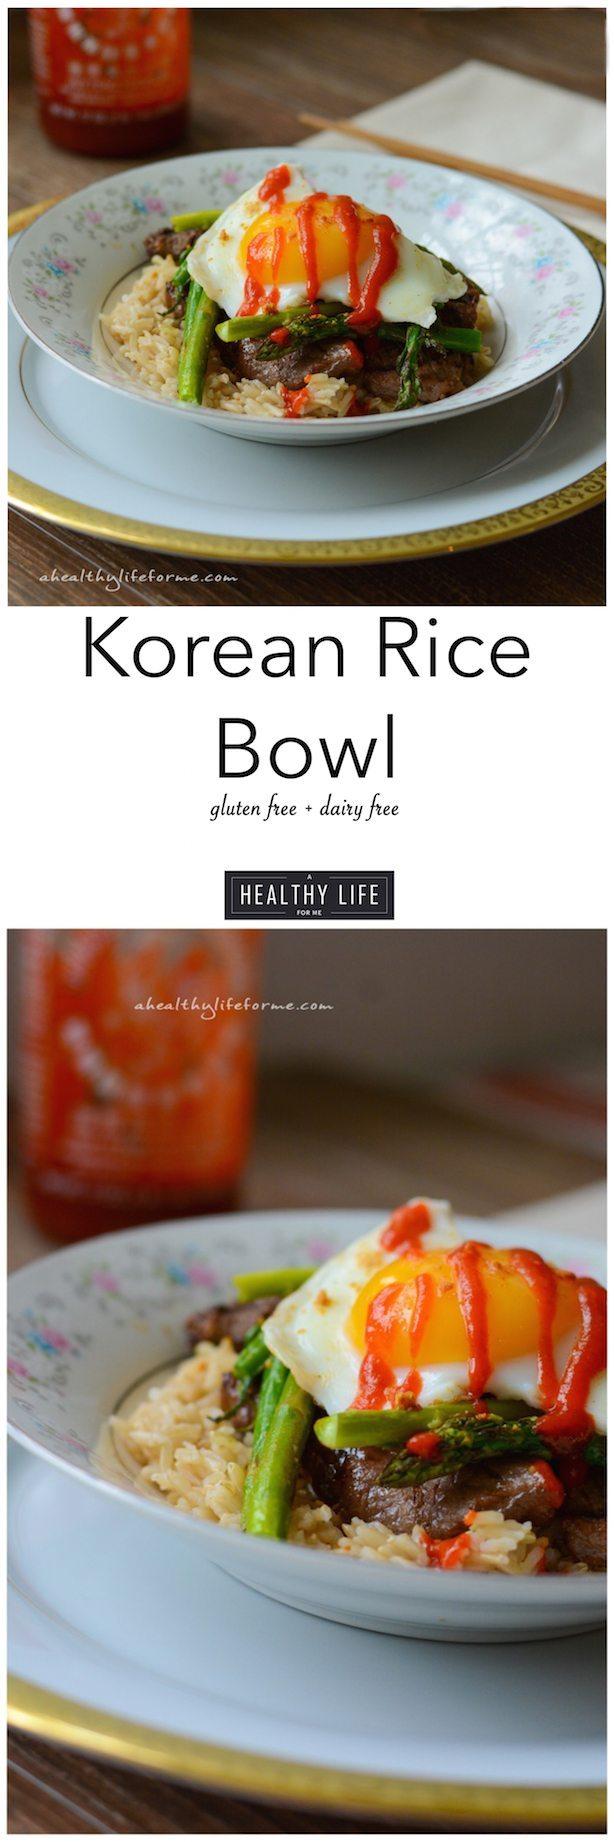 Korean Rice Bowl Recipe Gluten Free Dairy Free | ahealthylifeforme.com